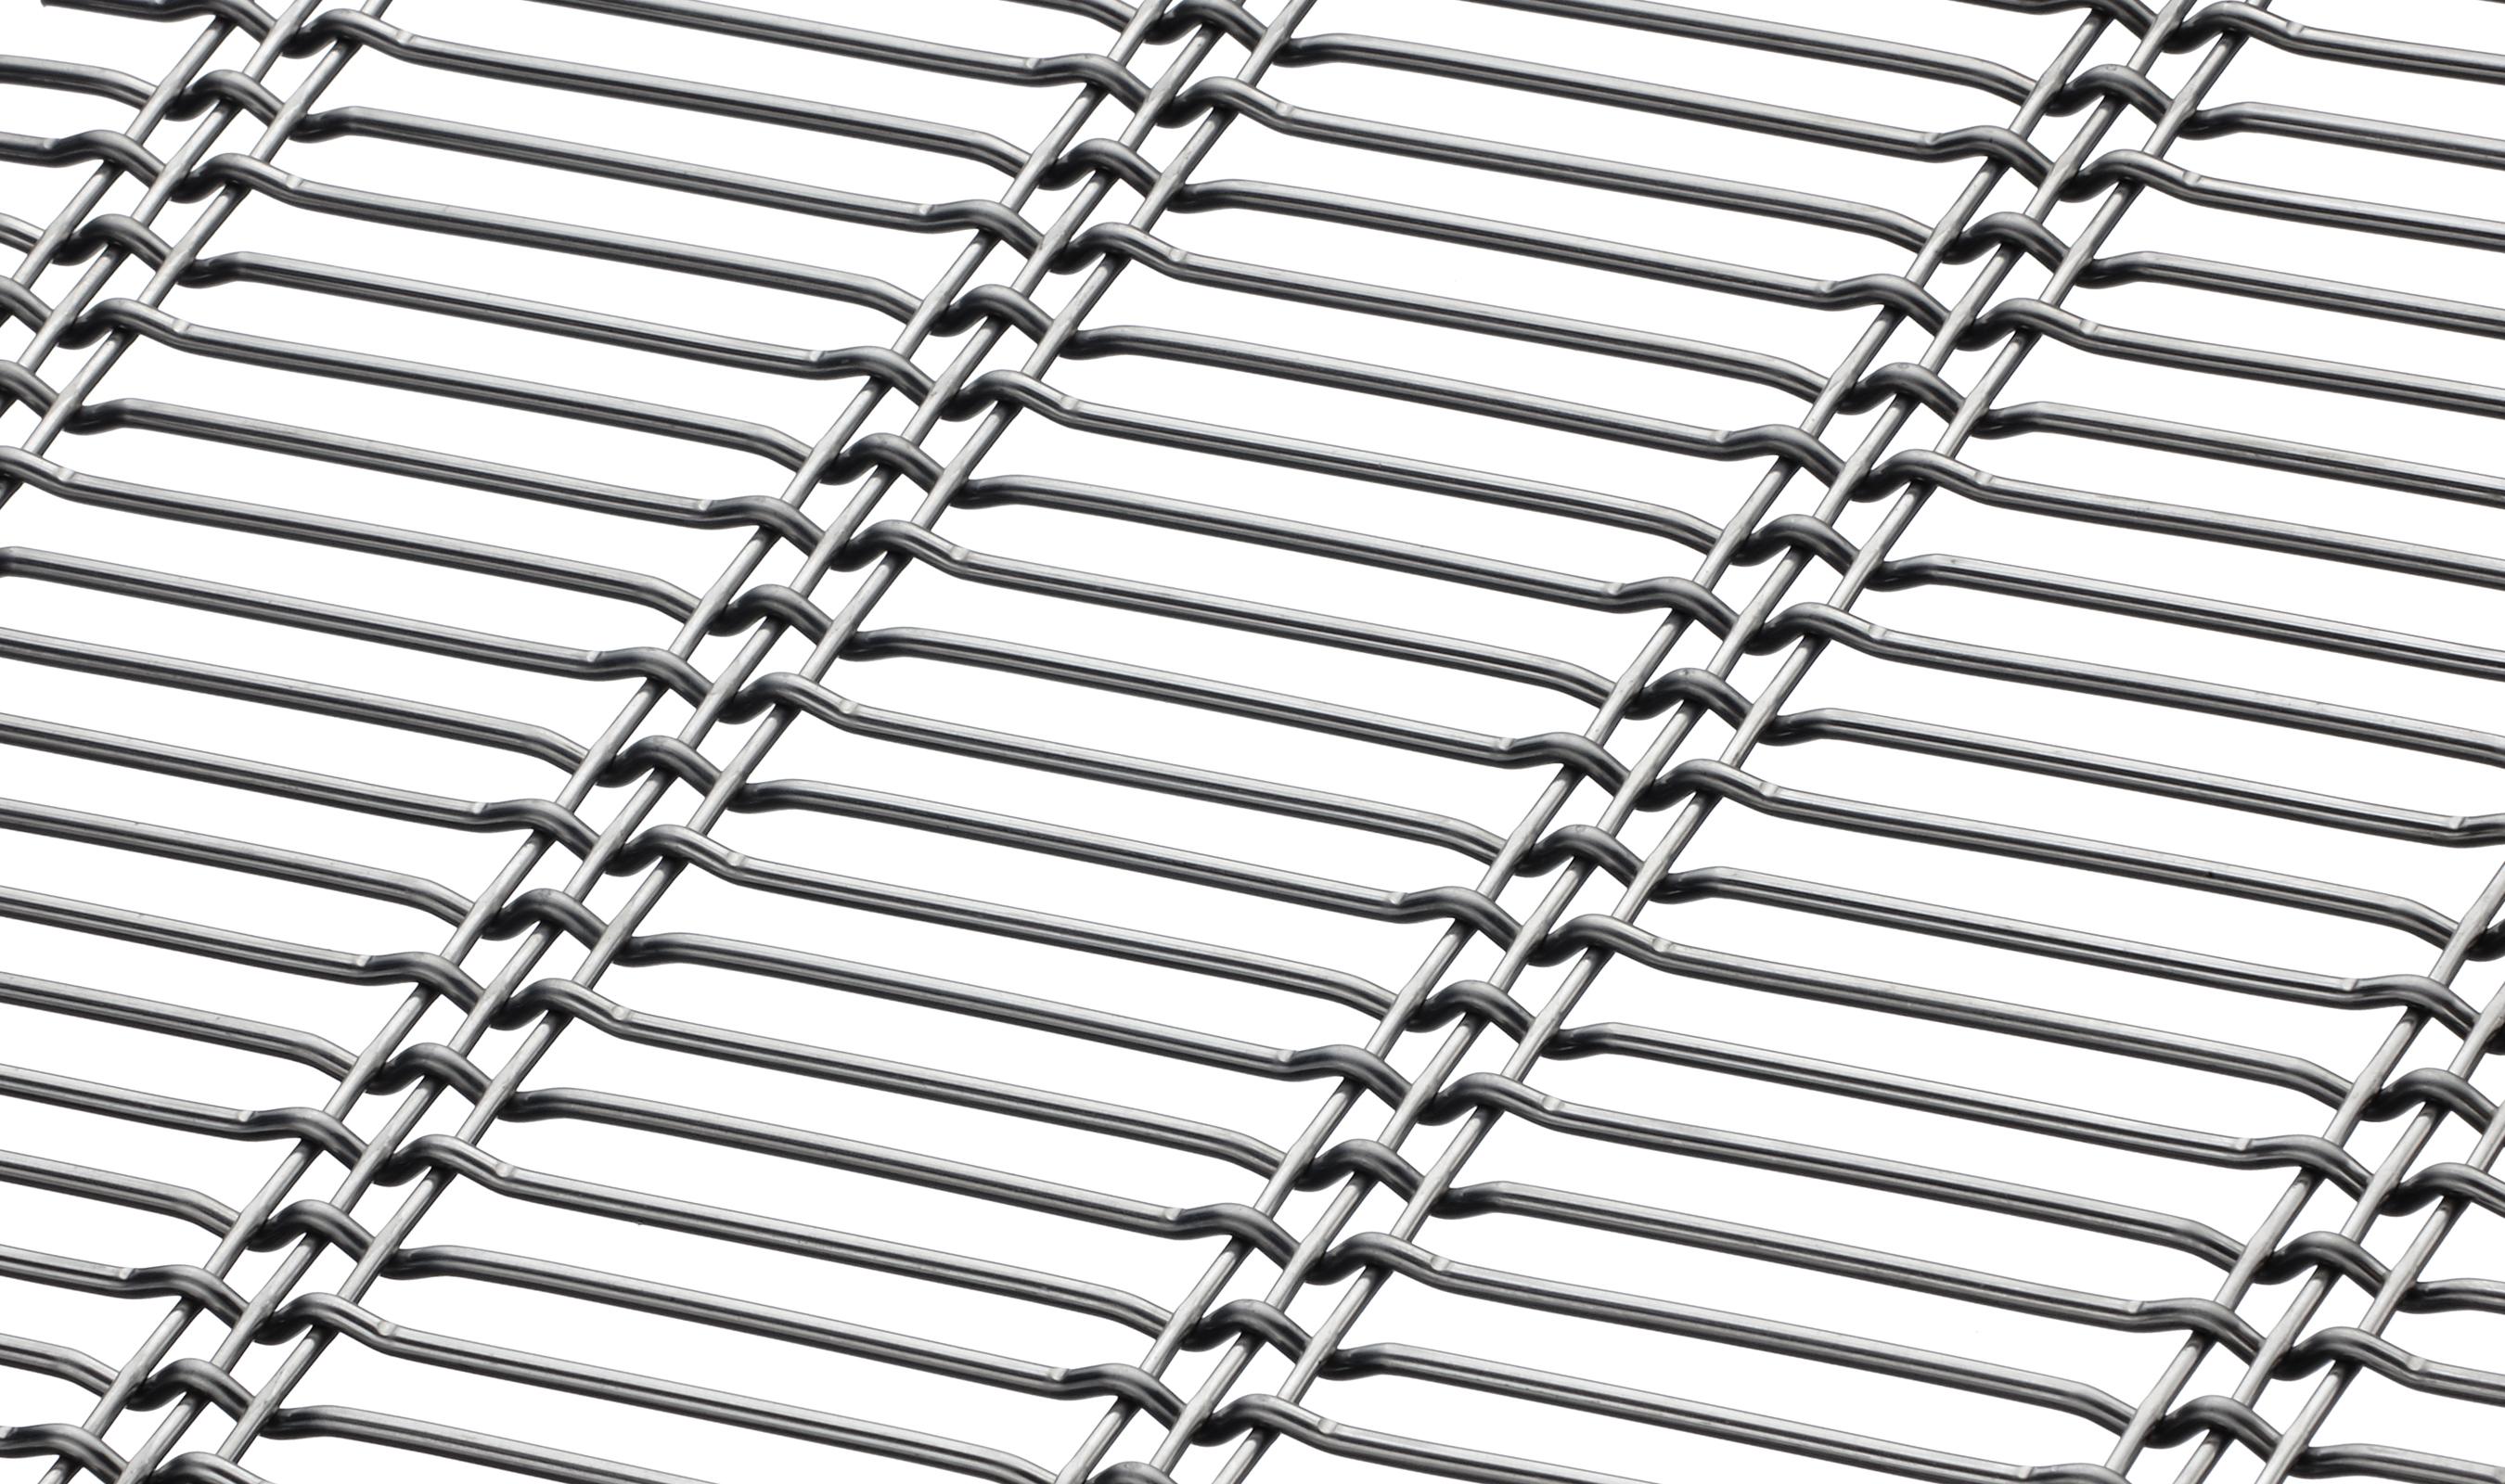 M31Z-6 woven wire mesh pattern